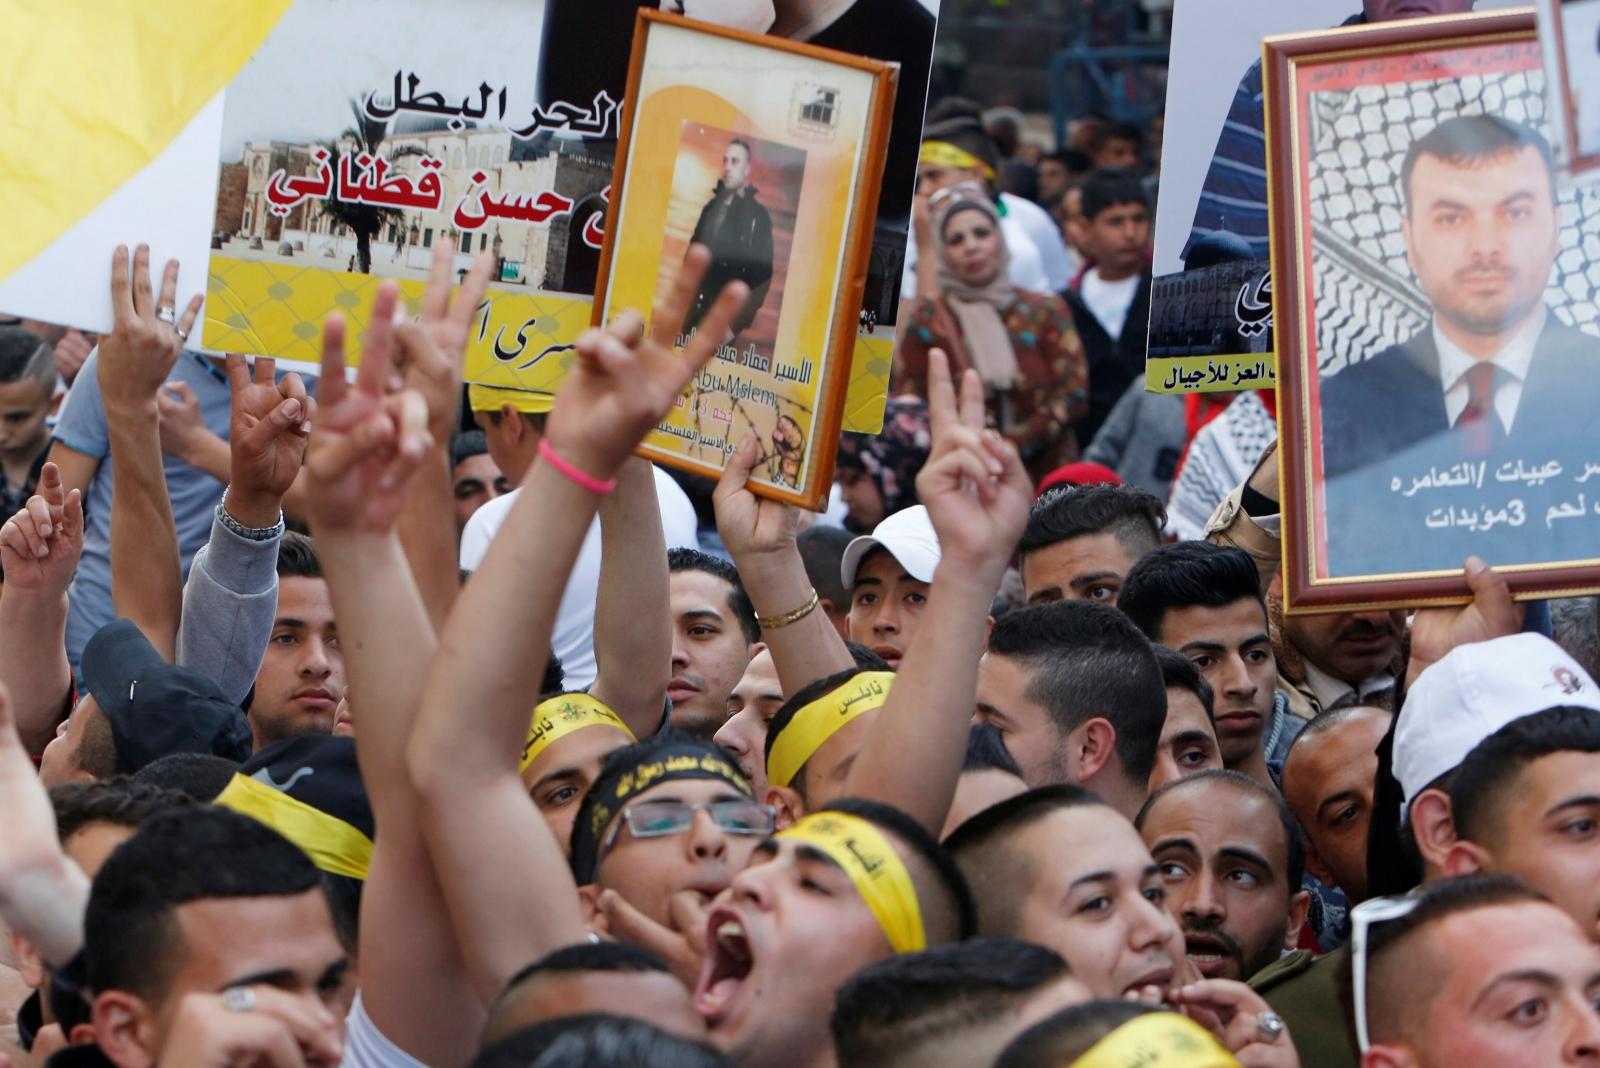 Barghouti's strike part of long road